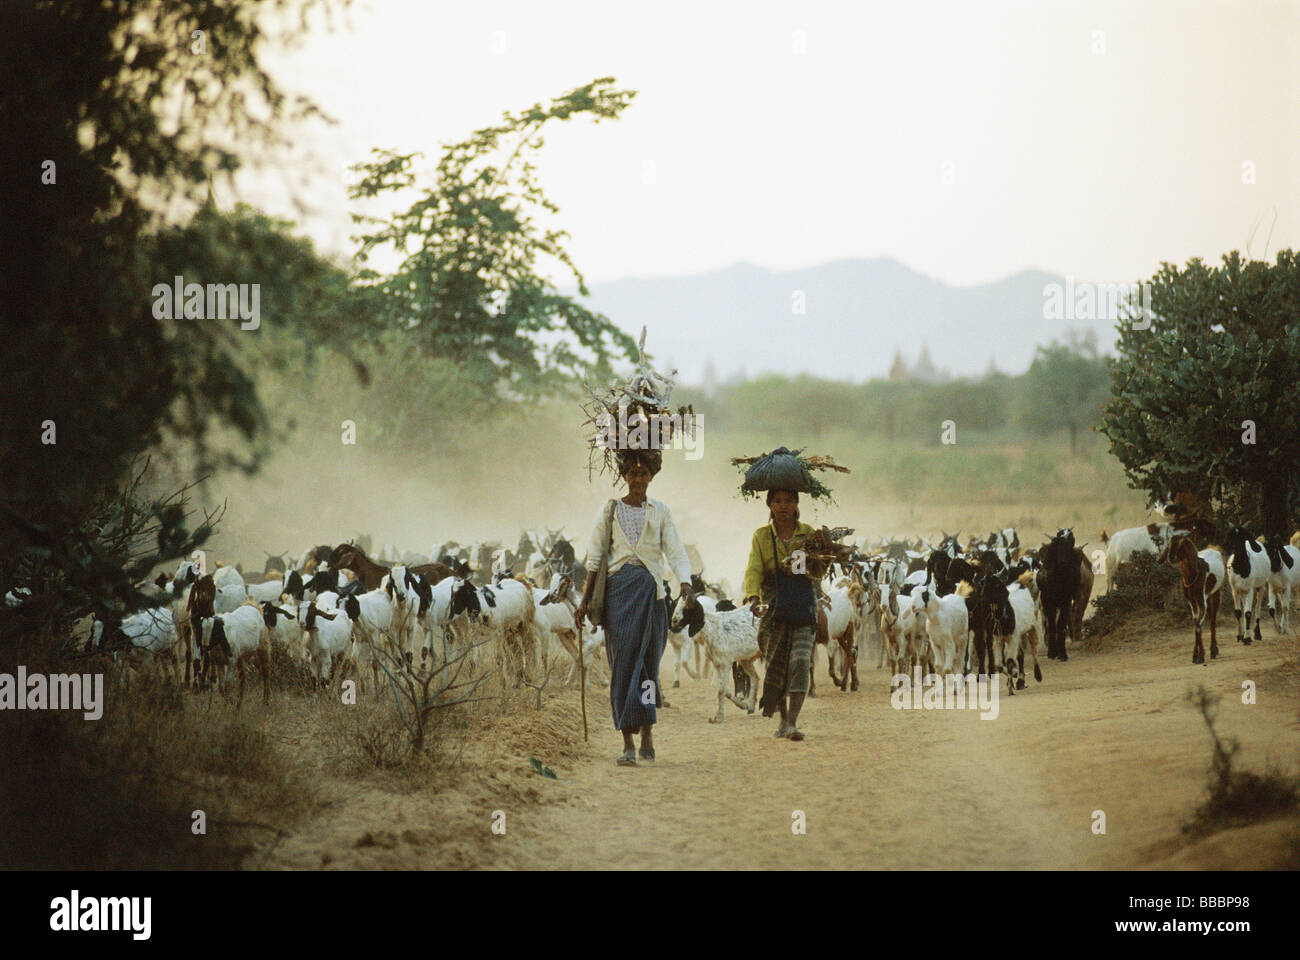 Myanmar (Burma), Bagan, Local women leading herd of goats. - Stock Image